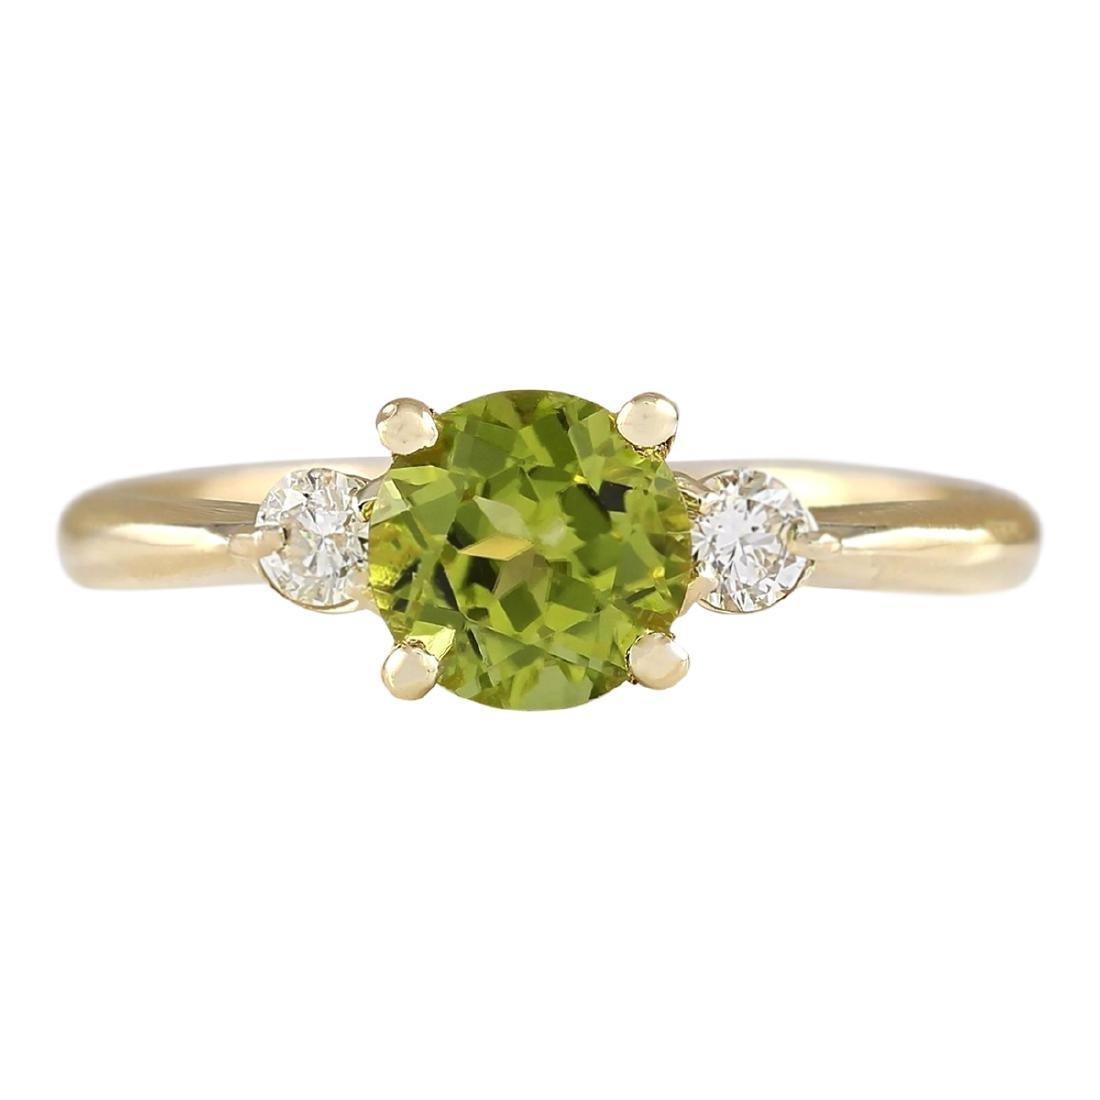 1.40 CTW Natural Peridot And Diamond Ring In 18K Yellow